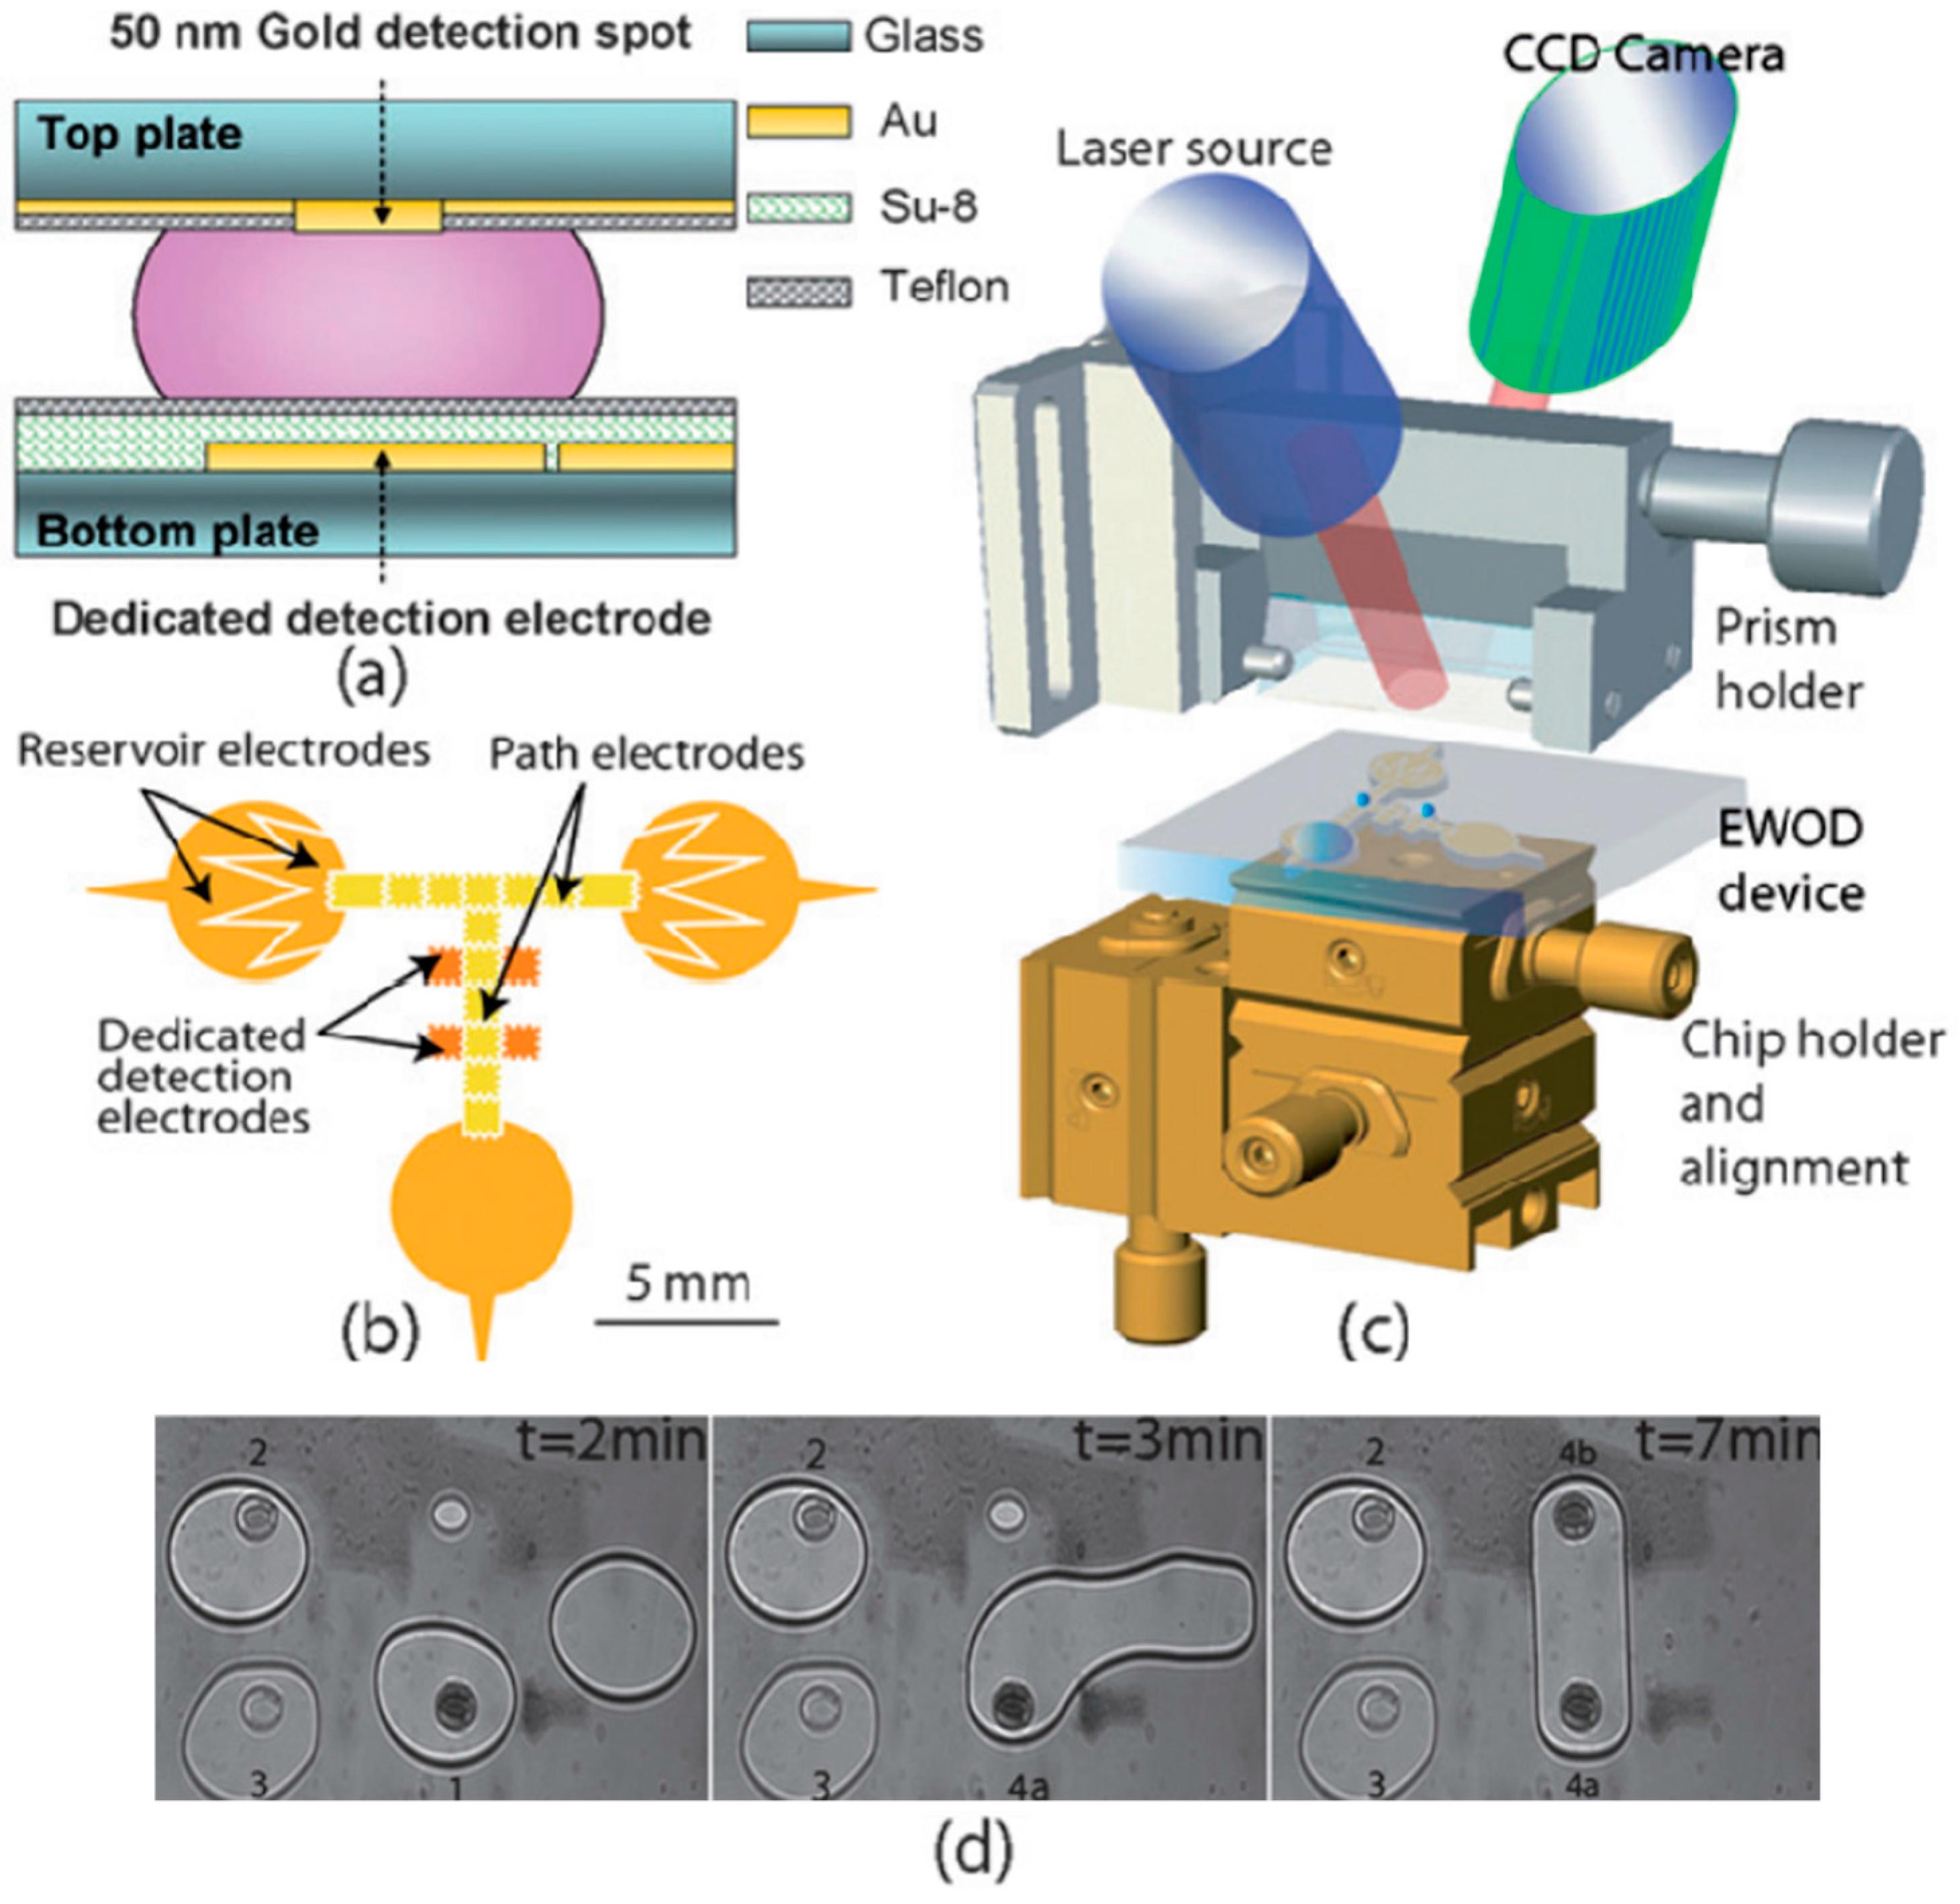 Sensors Free Full Text Microfluidic Surface Plasmon Resonance Gold Detector Schematic Diagram No